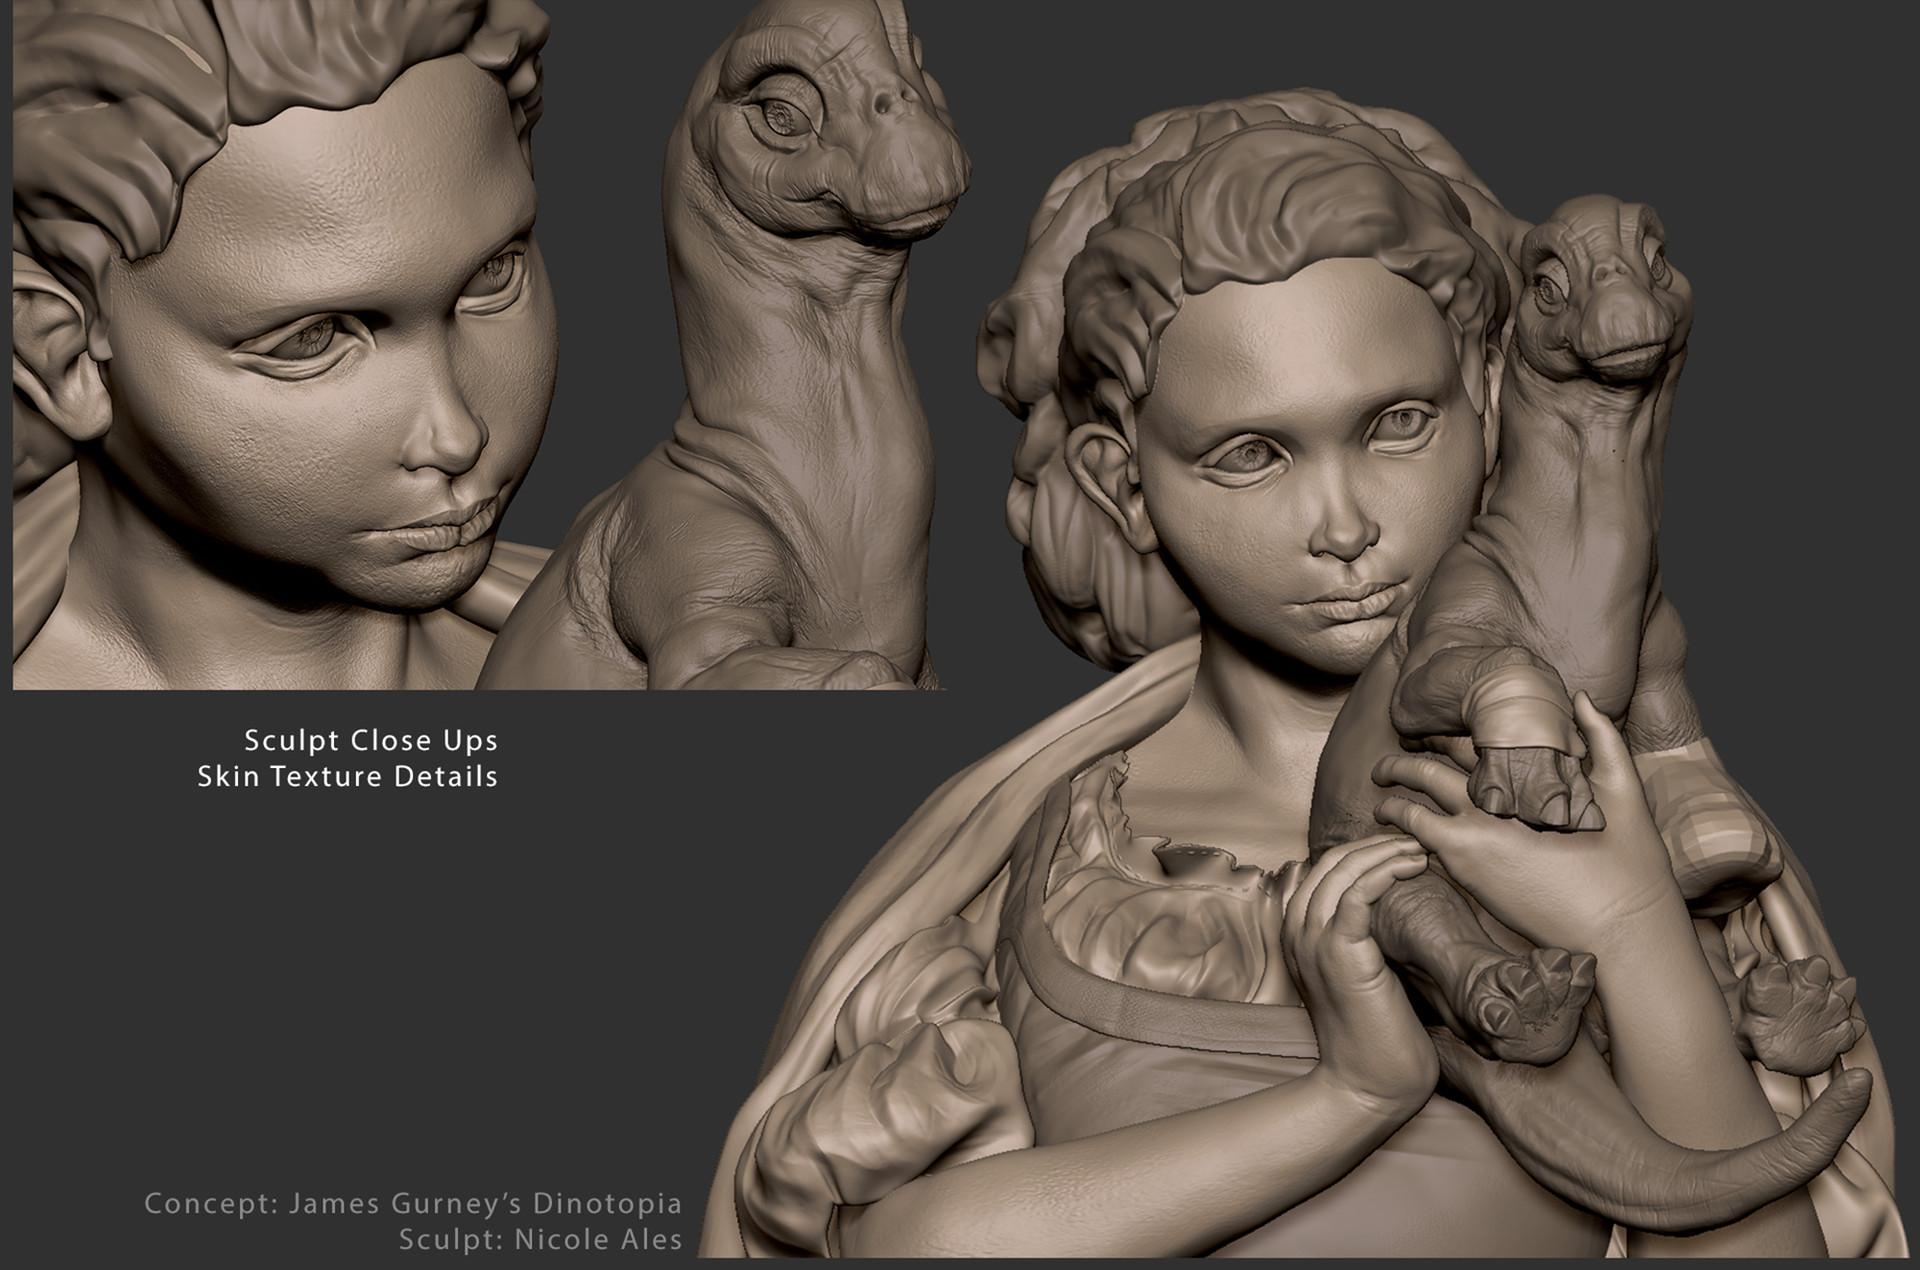 zbrush_sculpt_dintop.jpg